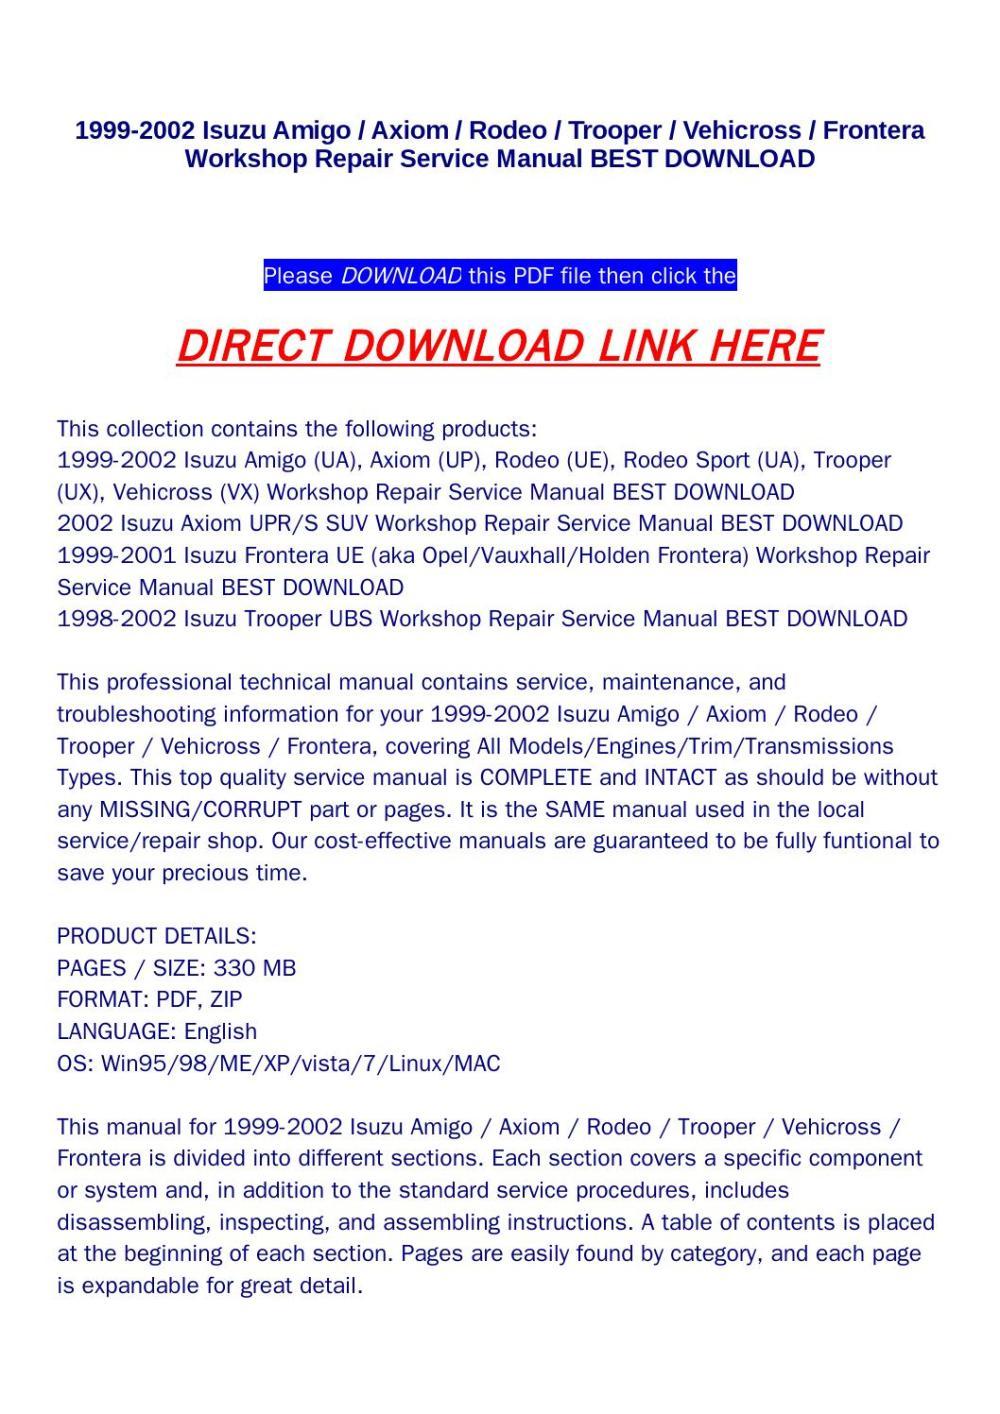 medium resolution of 1999 2002 isuzu amigo axiom rodeo trooper vehicross frontera workshop repair service manual best dow